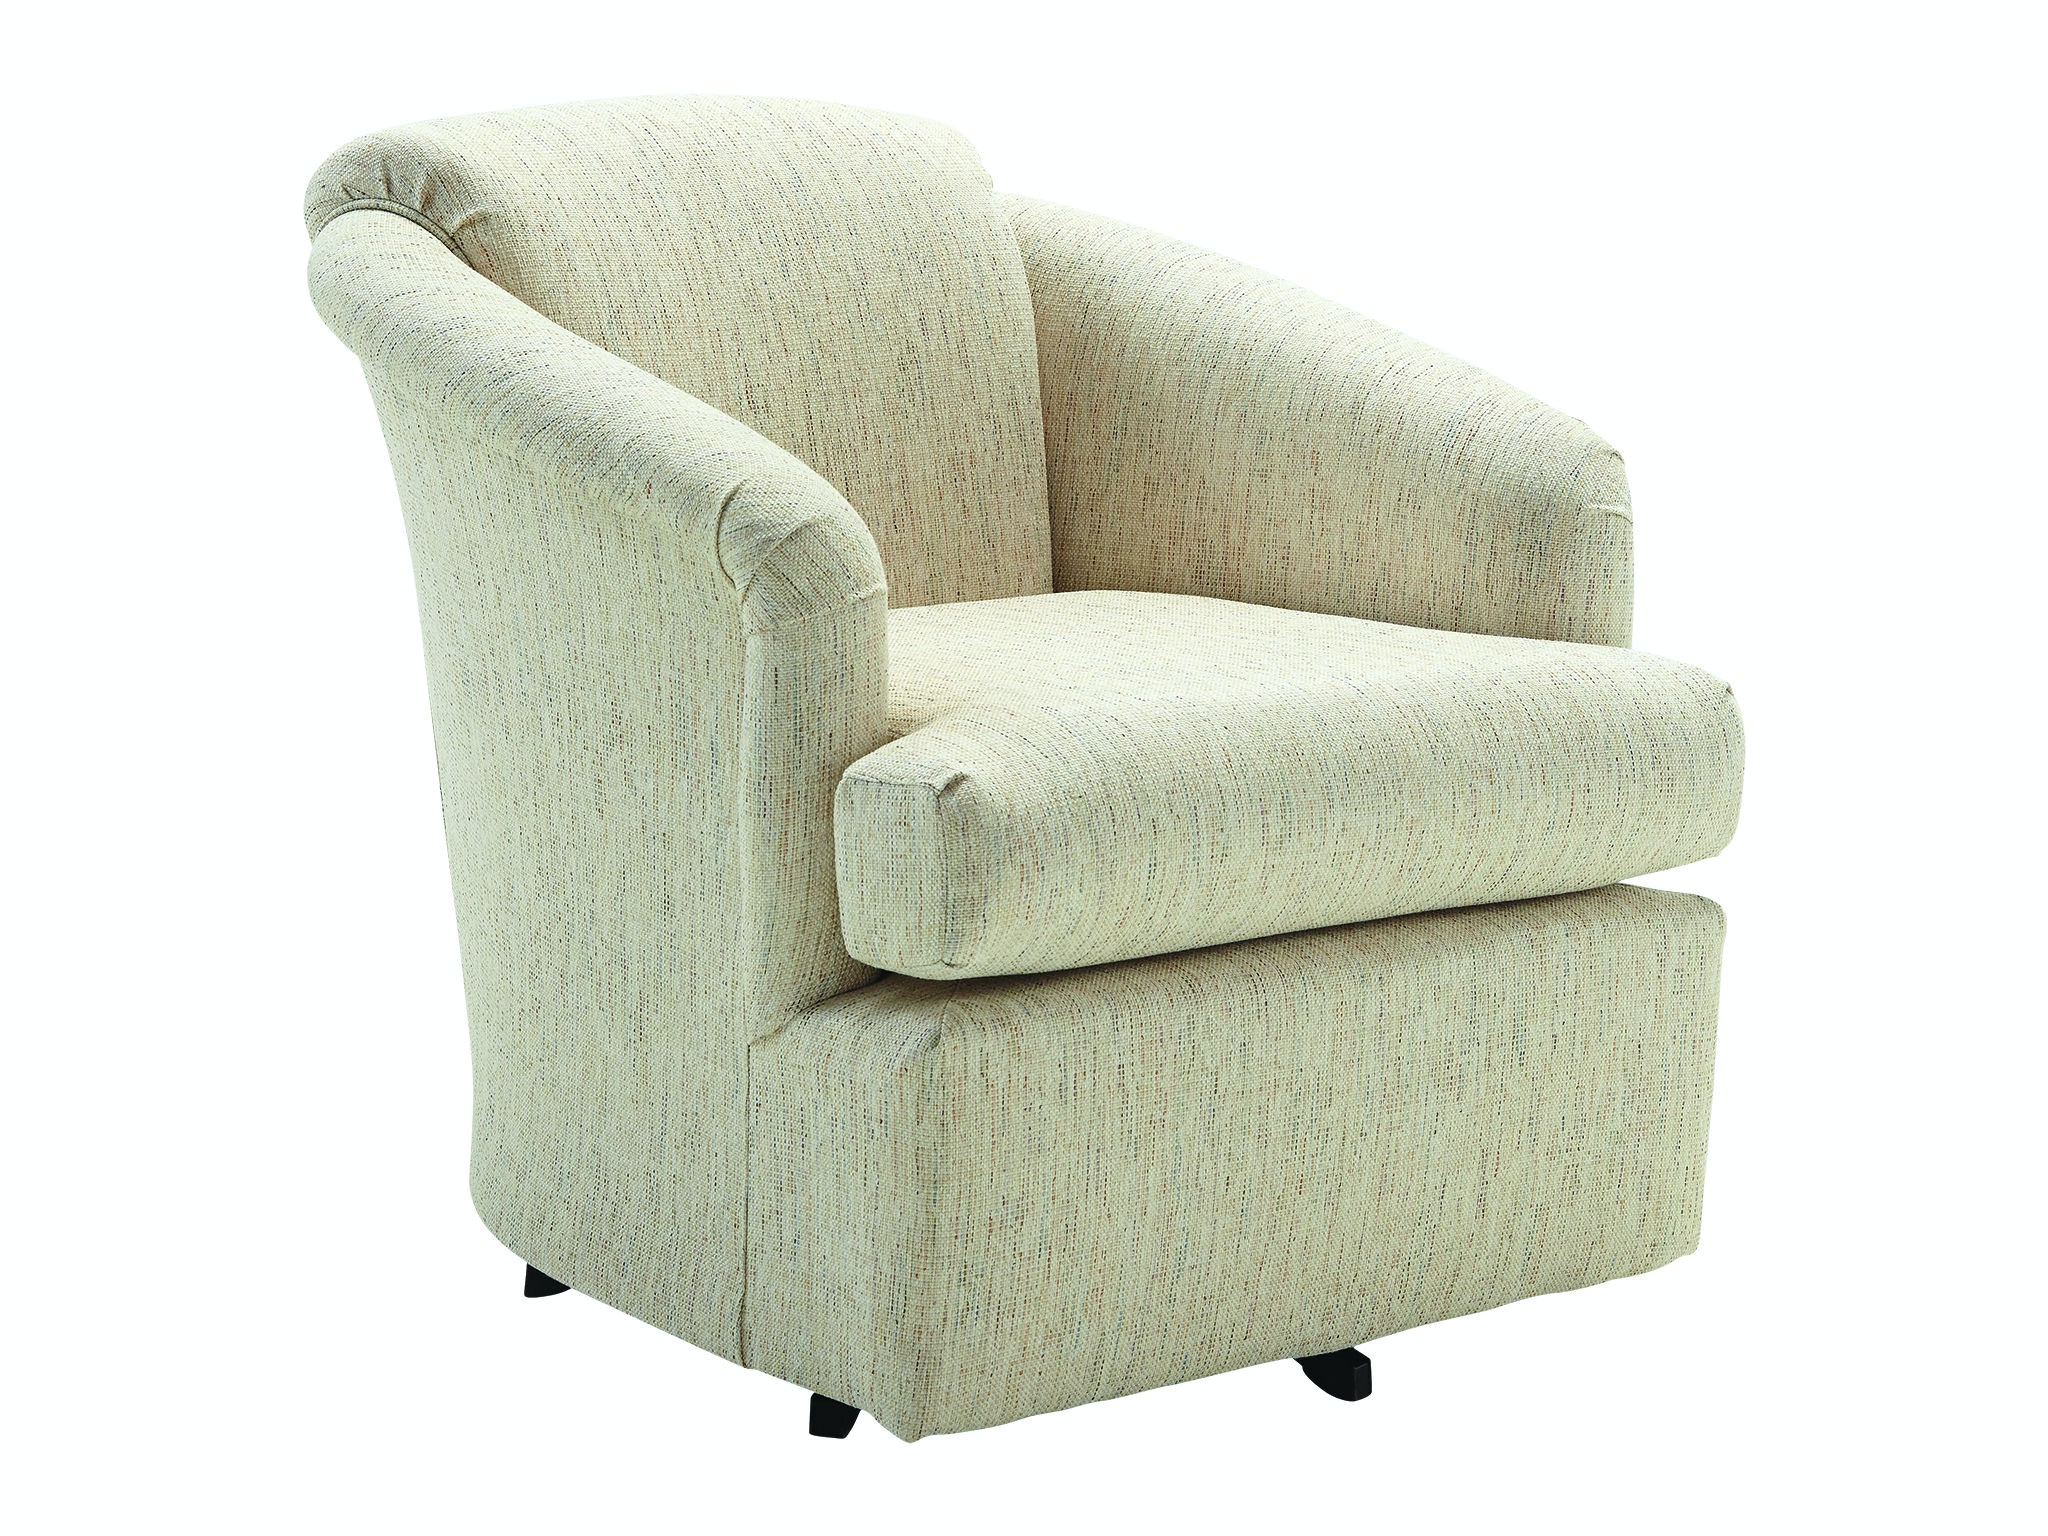 Delightful Best Home Furnishings Swivel Chair 2568